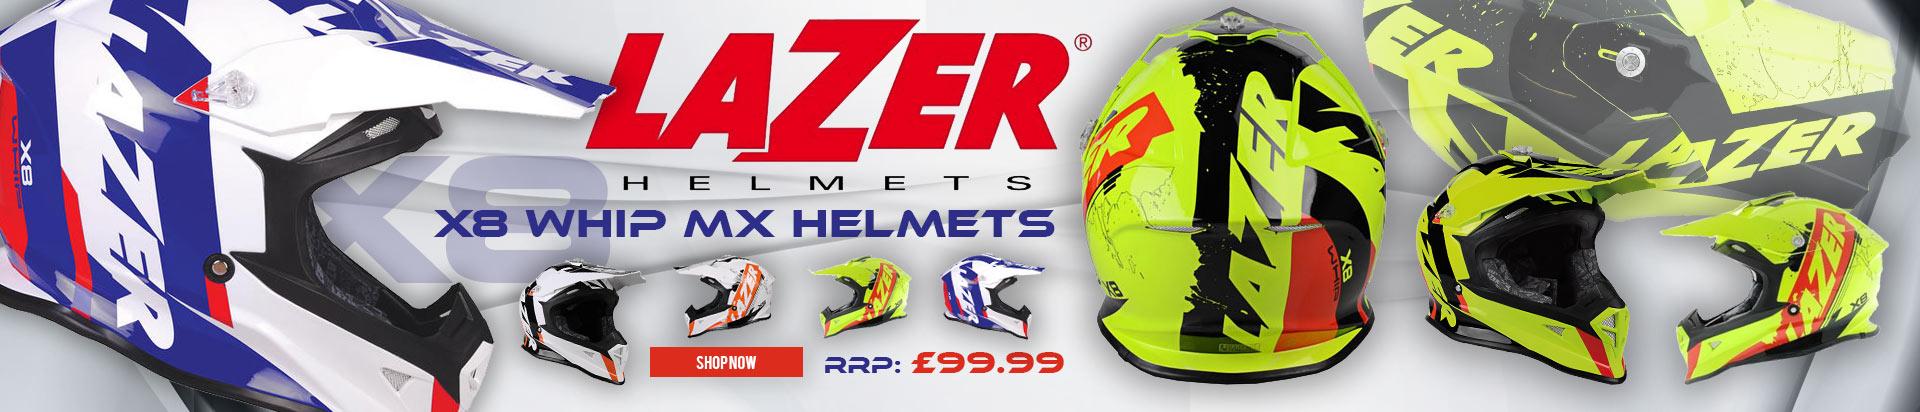 Lazer X8 Helmet